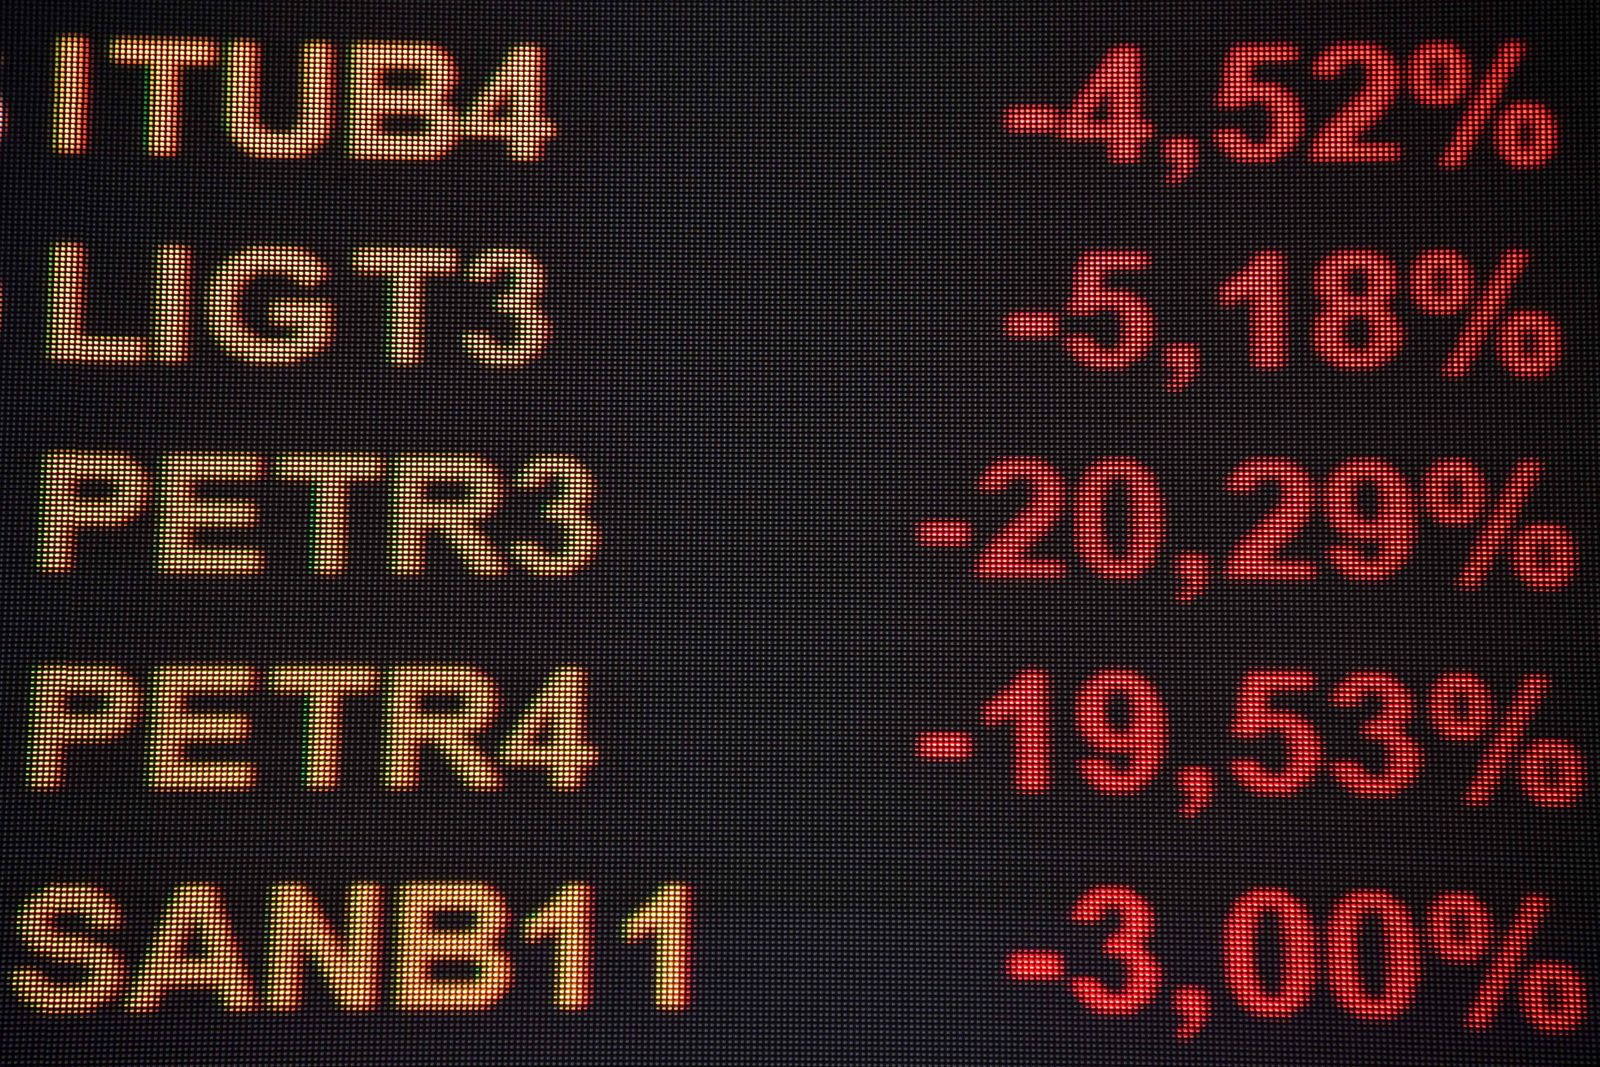 BRAZIL-FINANCE-ECONOMY-OIL-PETROBRAS